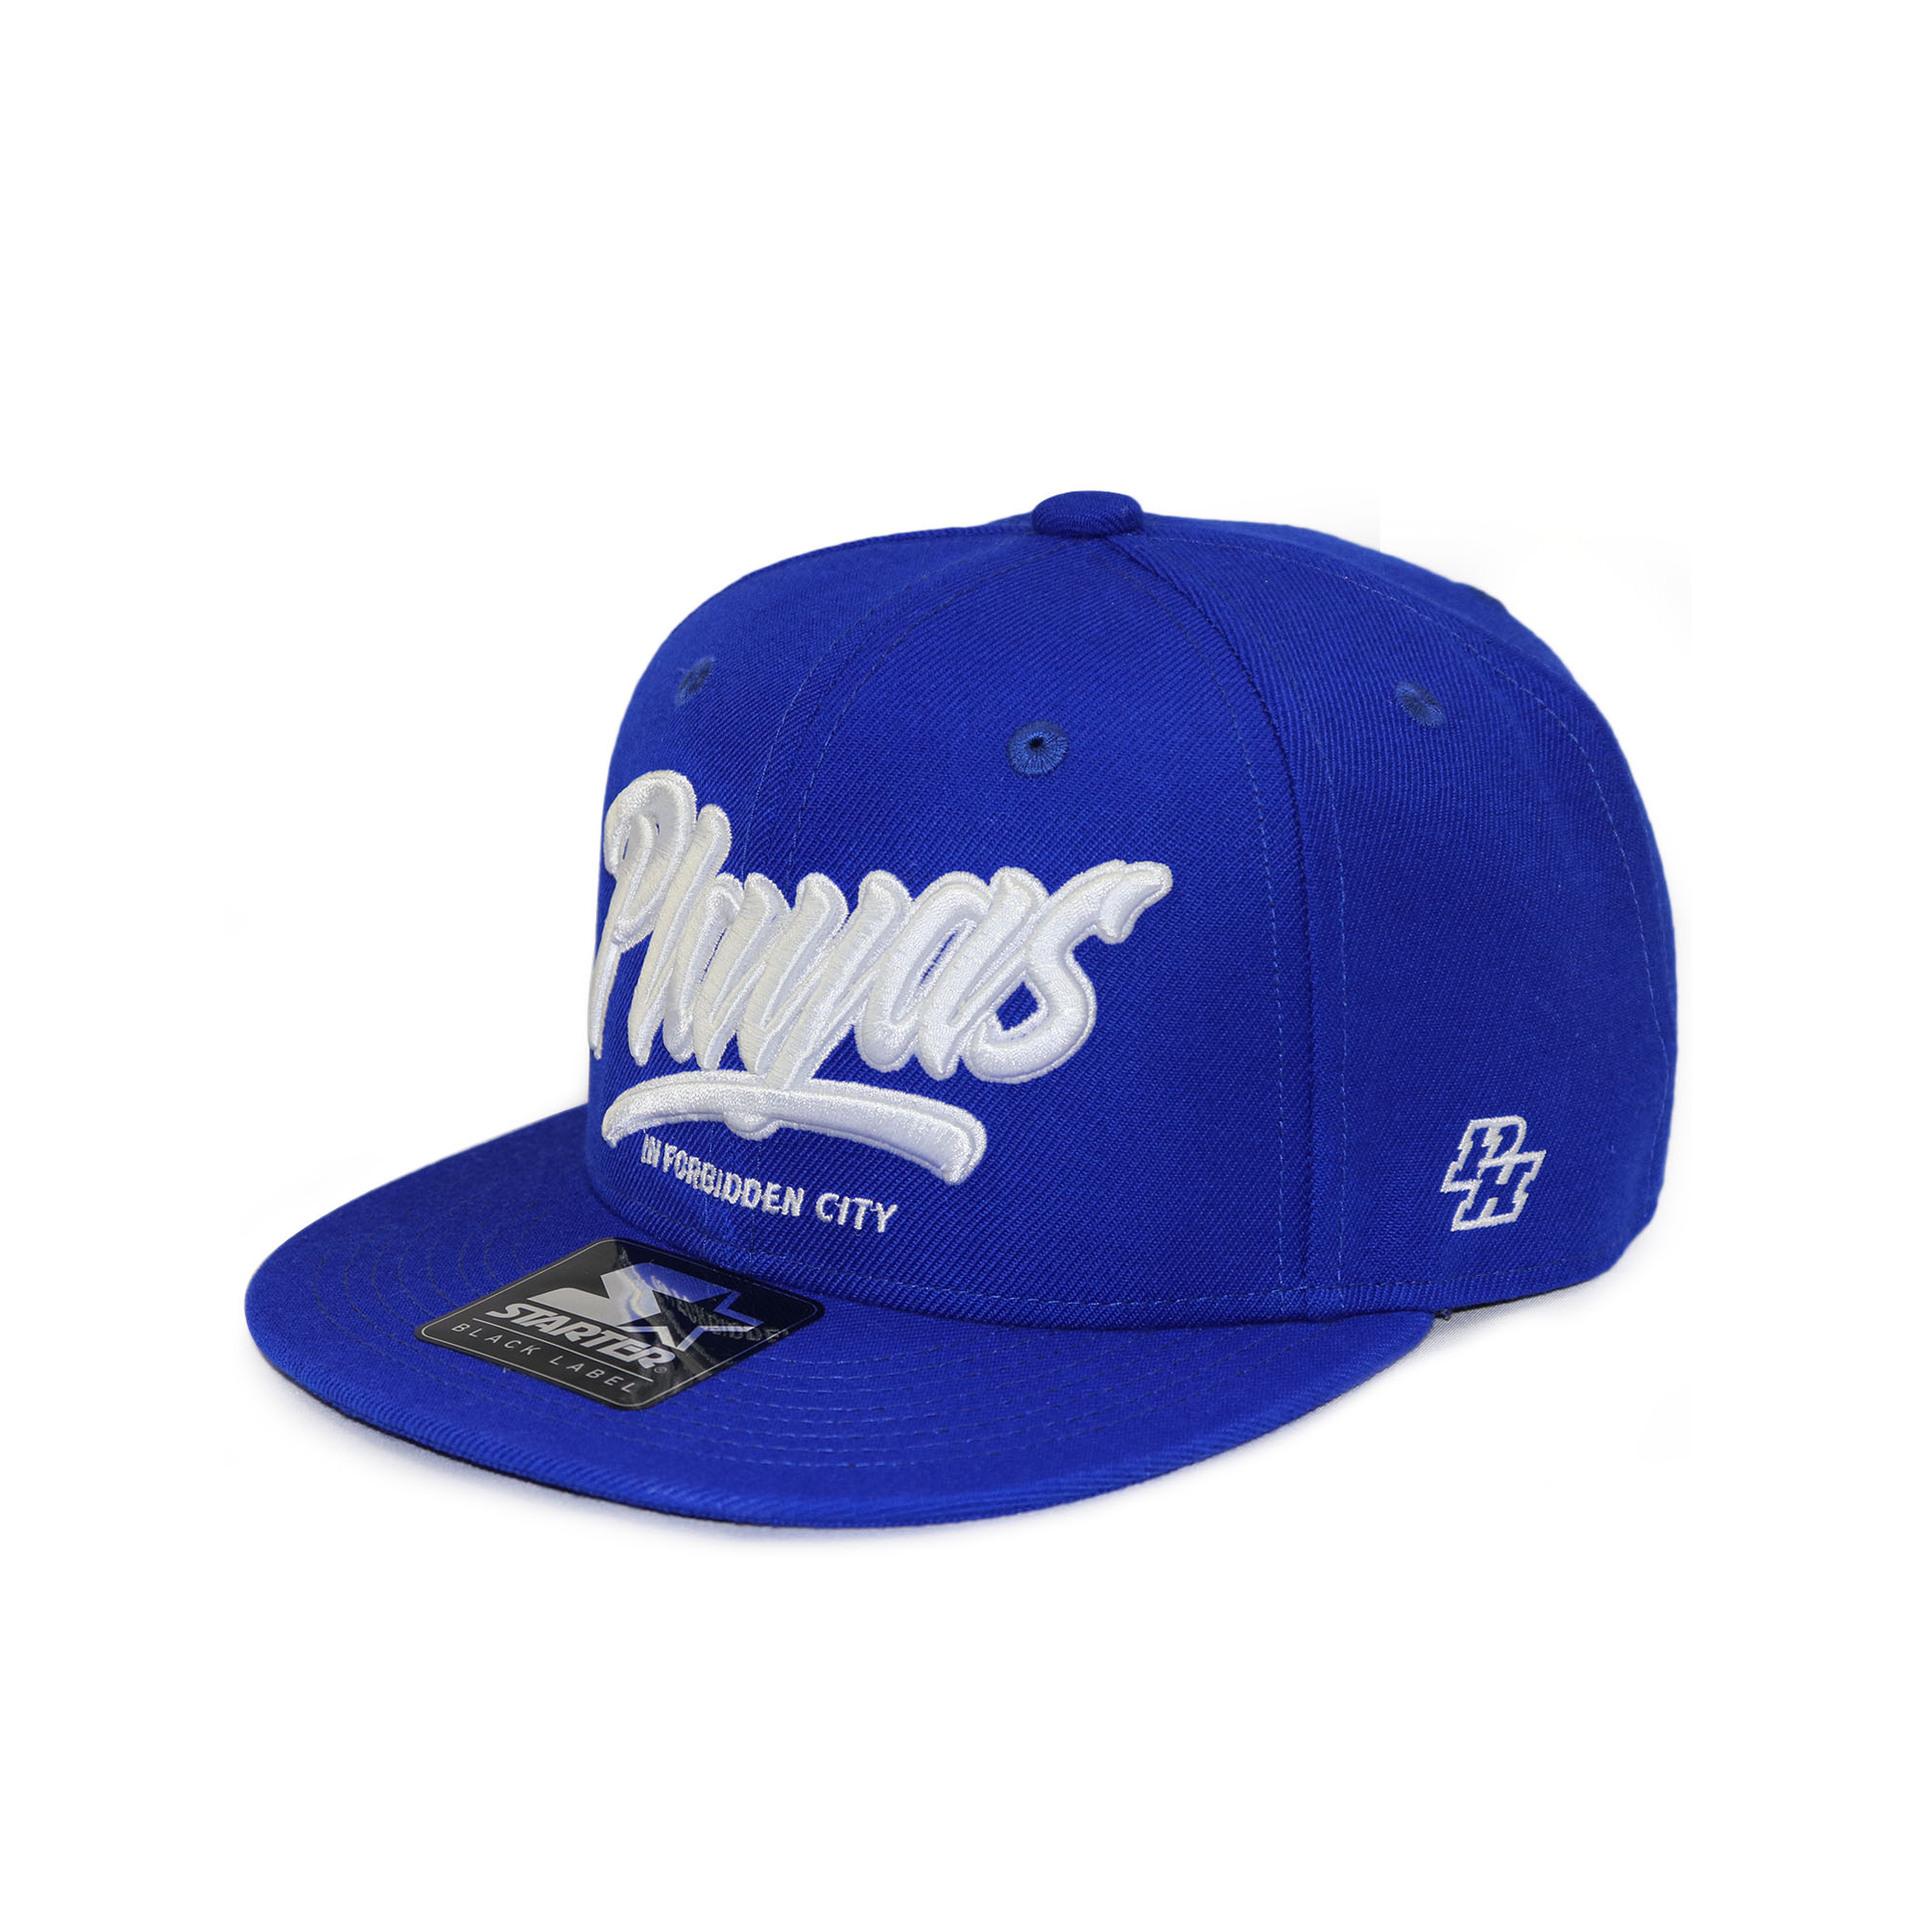 starter潮牌代加工帽厂定做欧美潮流嘻哈帽3d立体刺绣平檐棒球帽